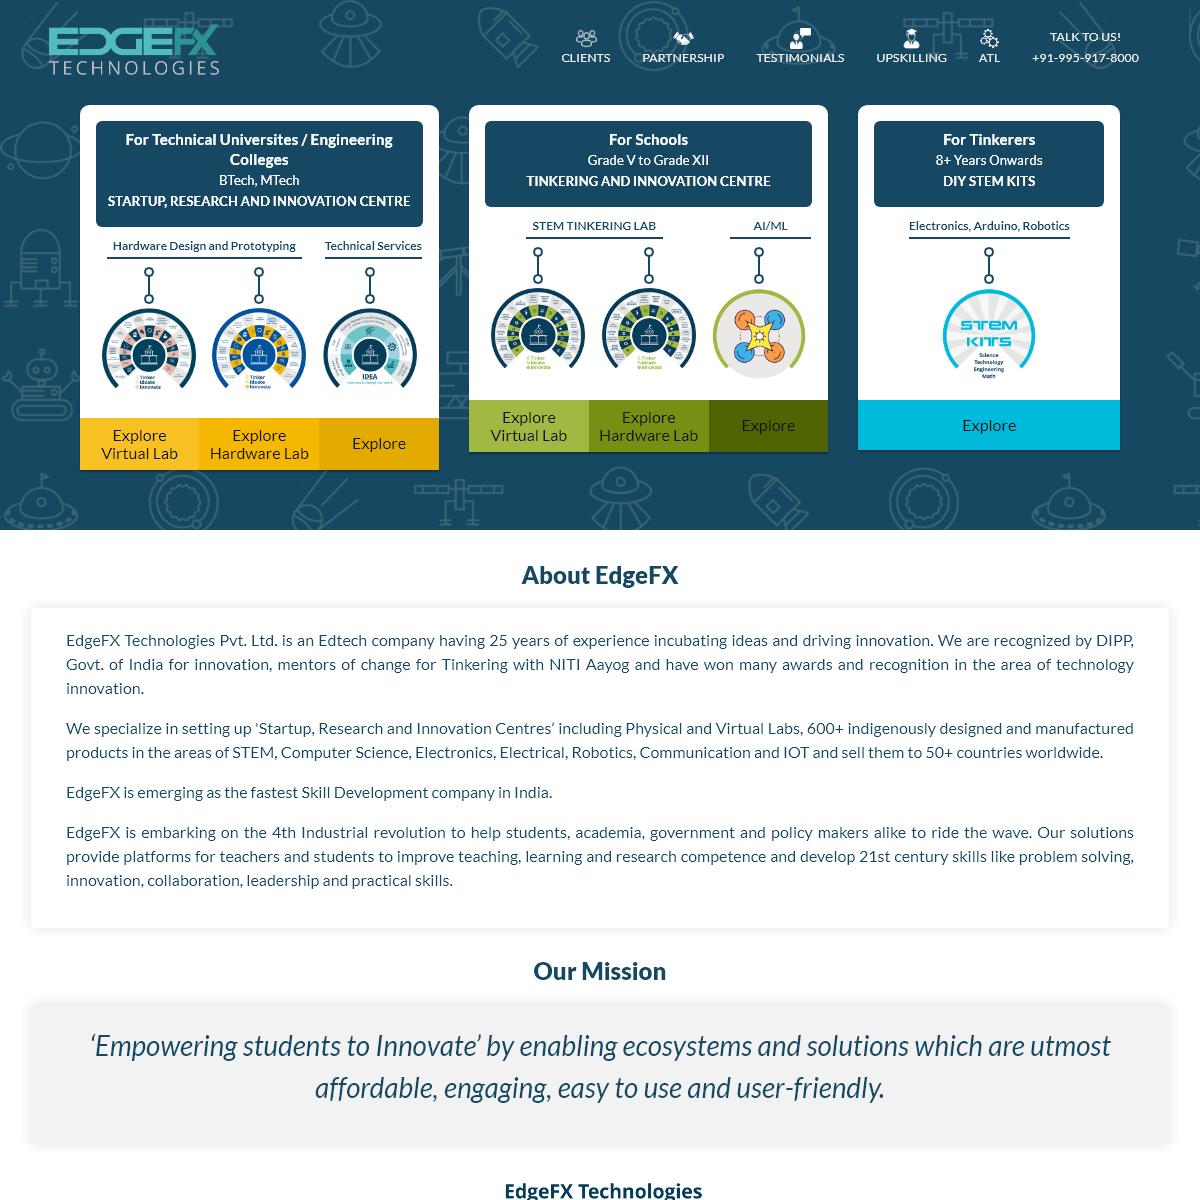 EdgeFX Technologies